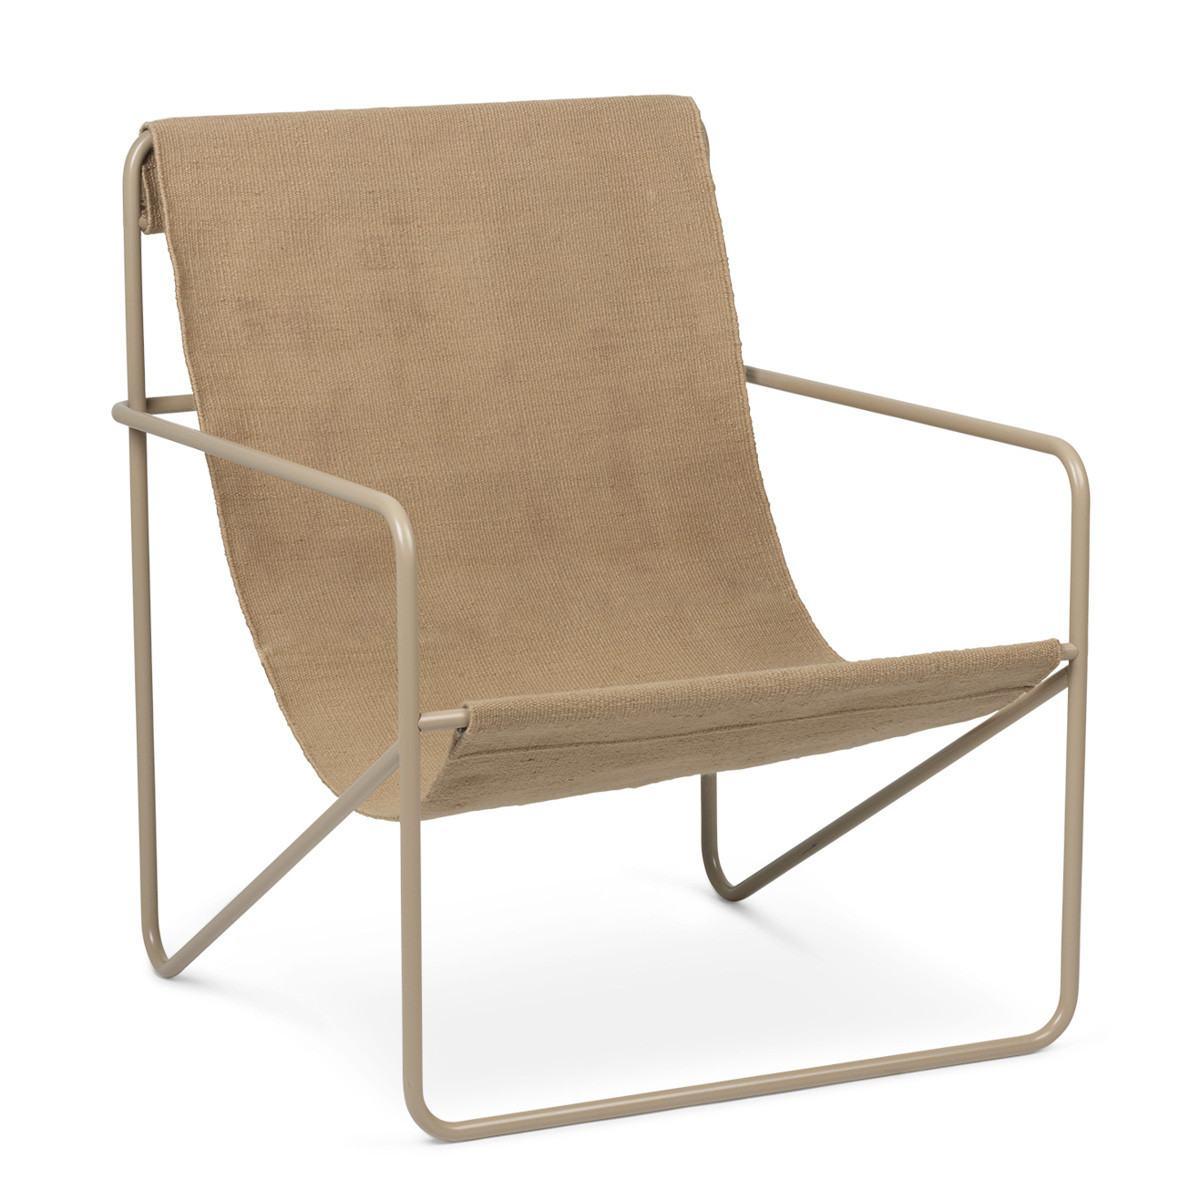 Ferm Living Desert Lounge Chair - Solid-Cashmere